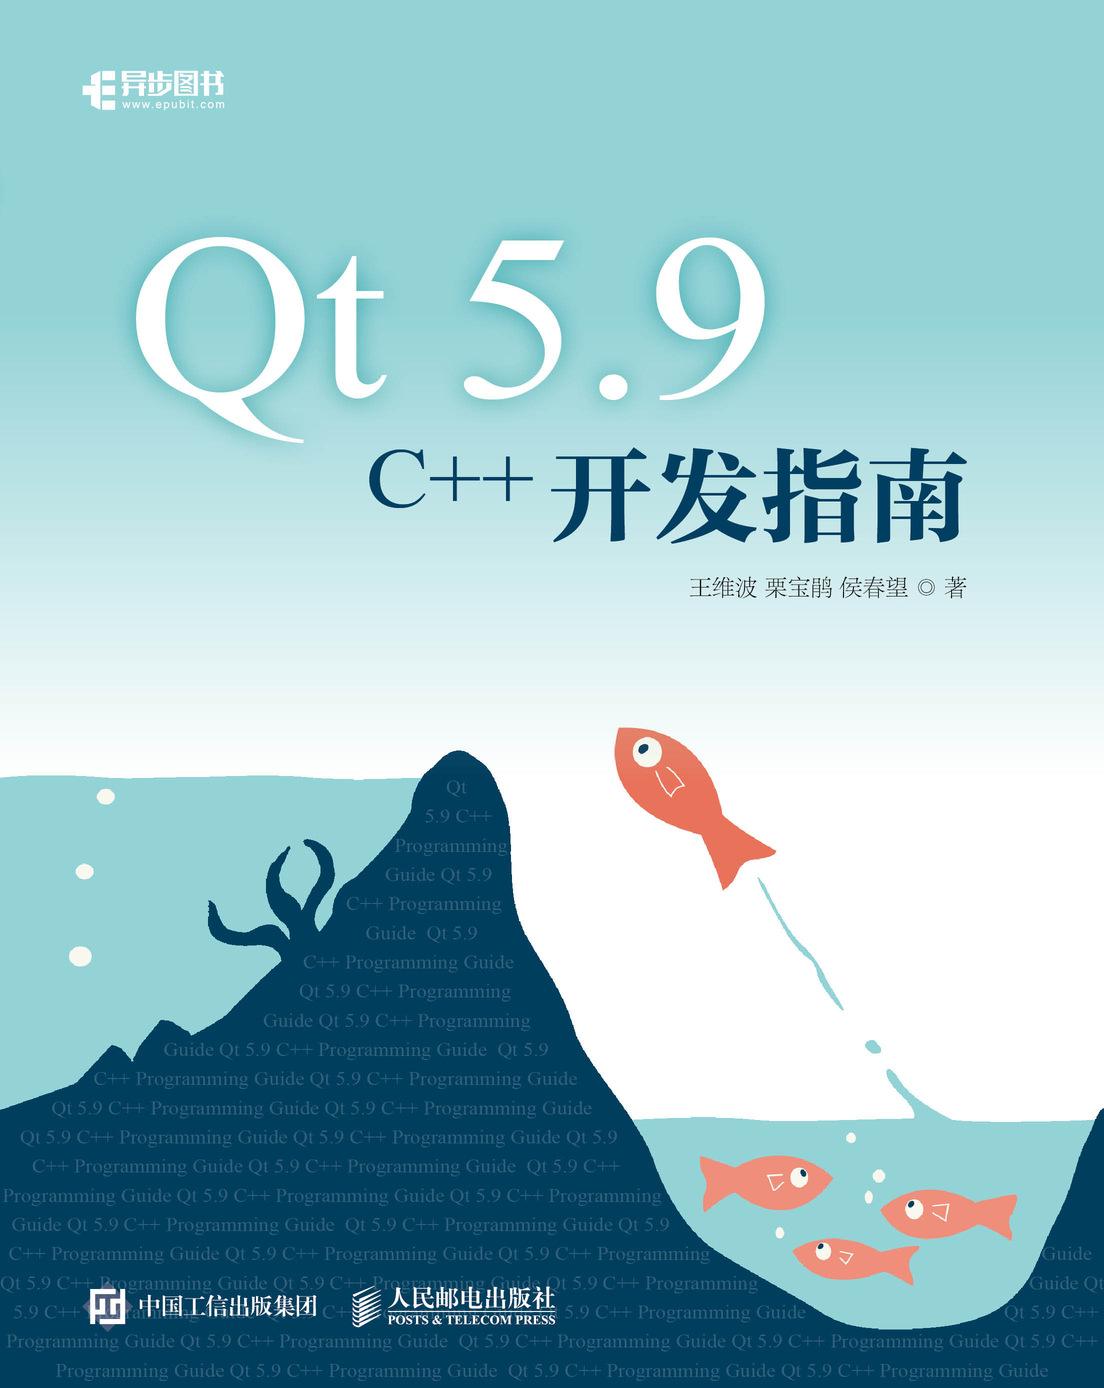 Qt 5.9 C++开发指南 PDF格式高清电子书免费下载